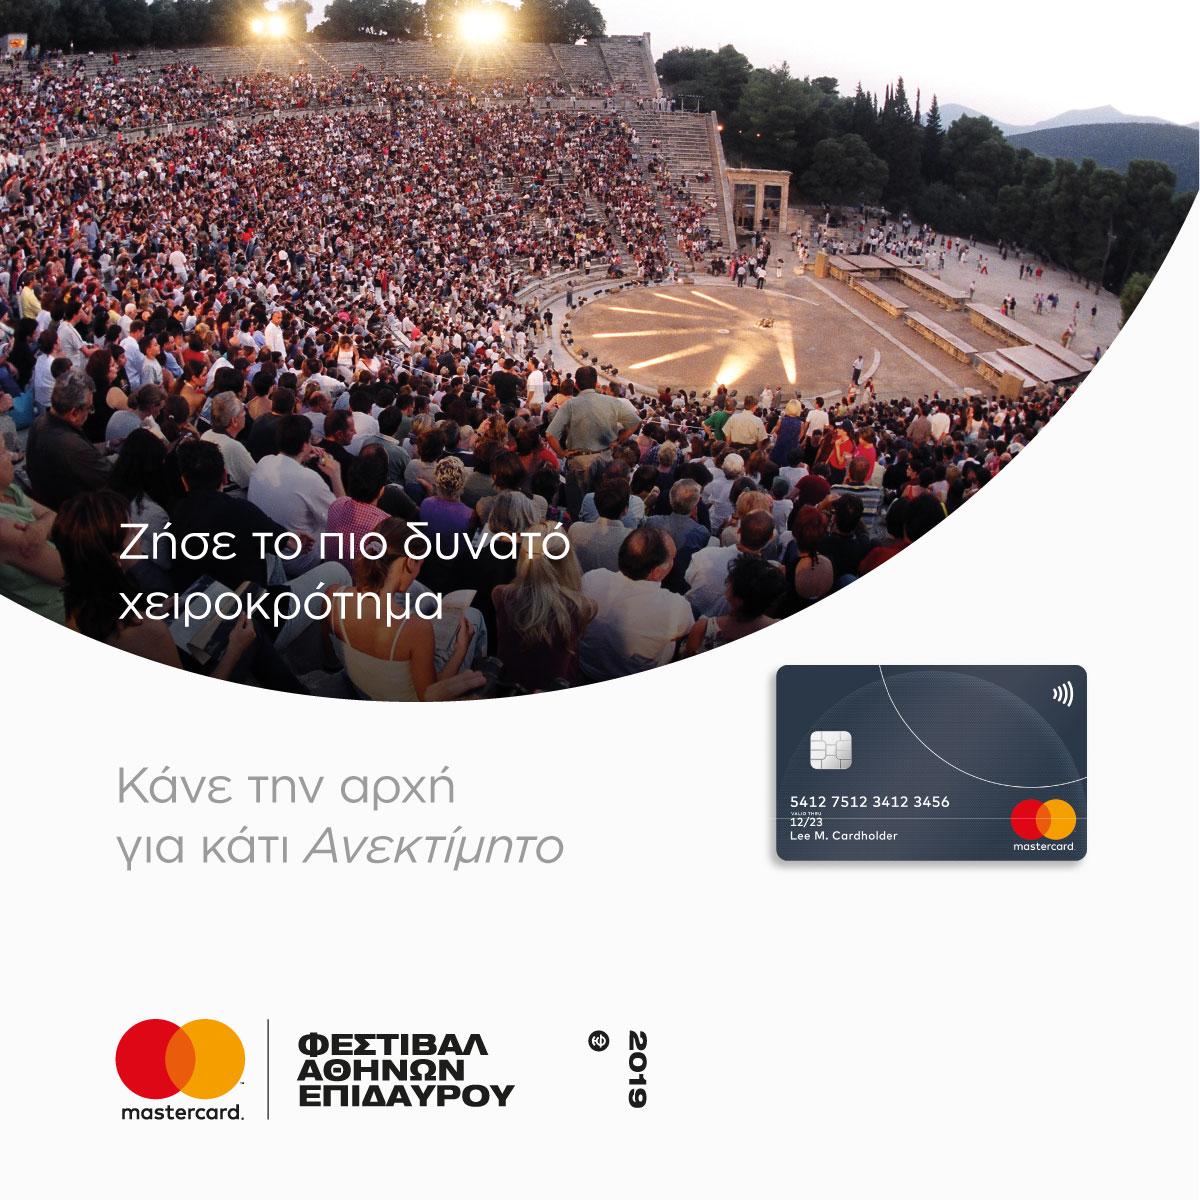 Mastercard Φεστιβάλ Αθηνών Επιδαύρου 2